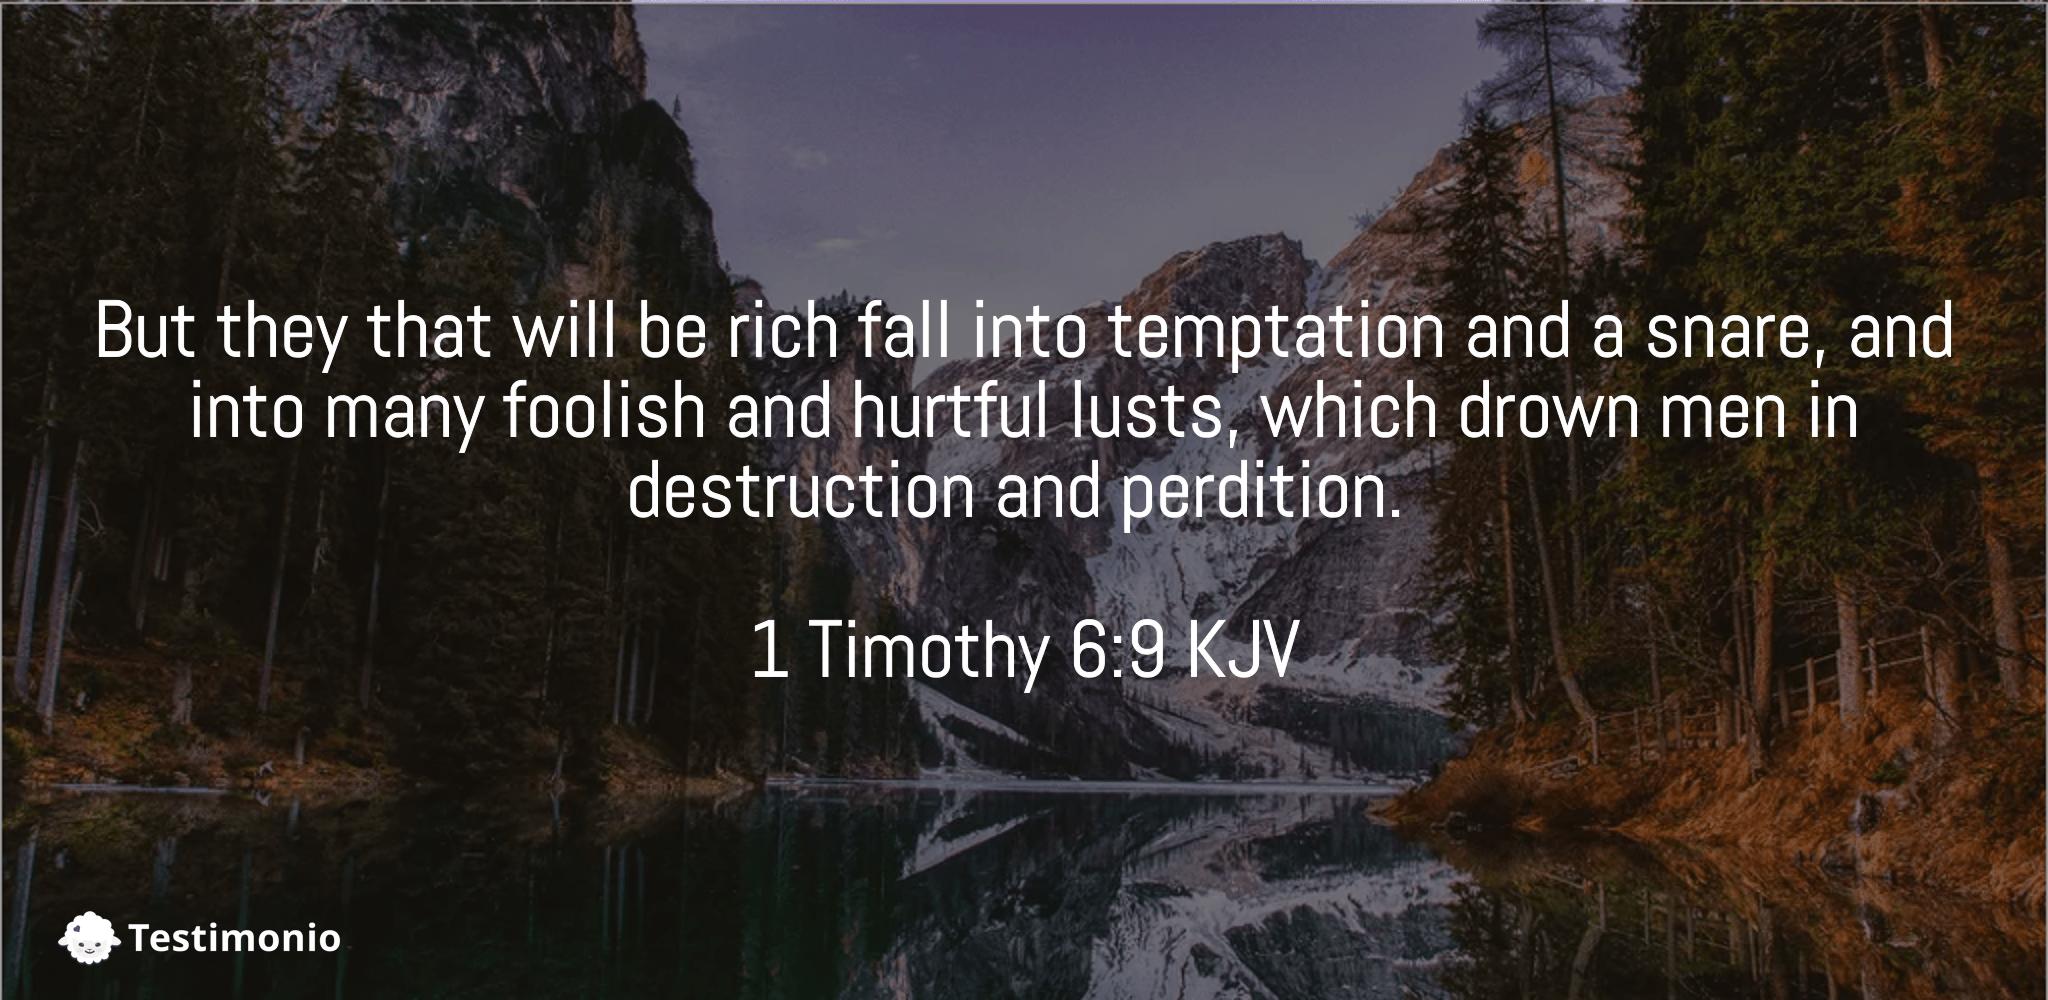 1 Timothy 6:9